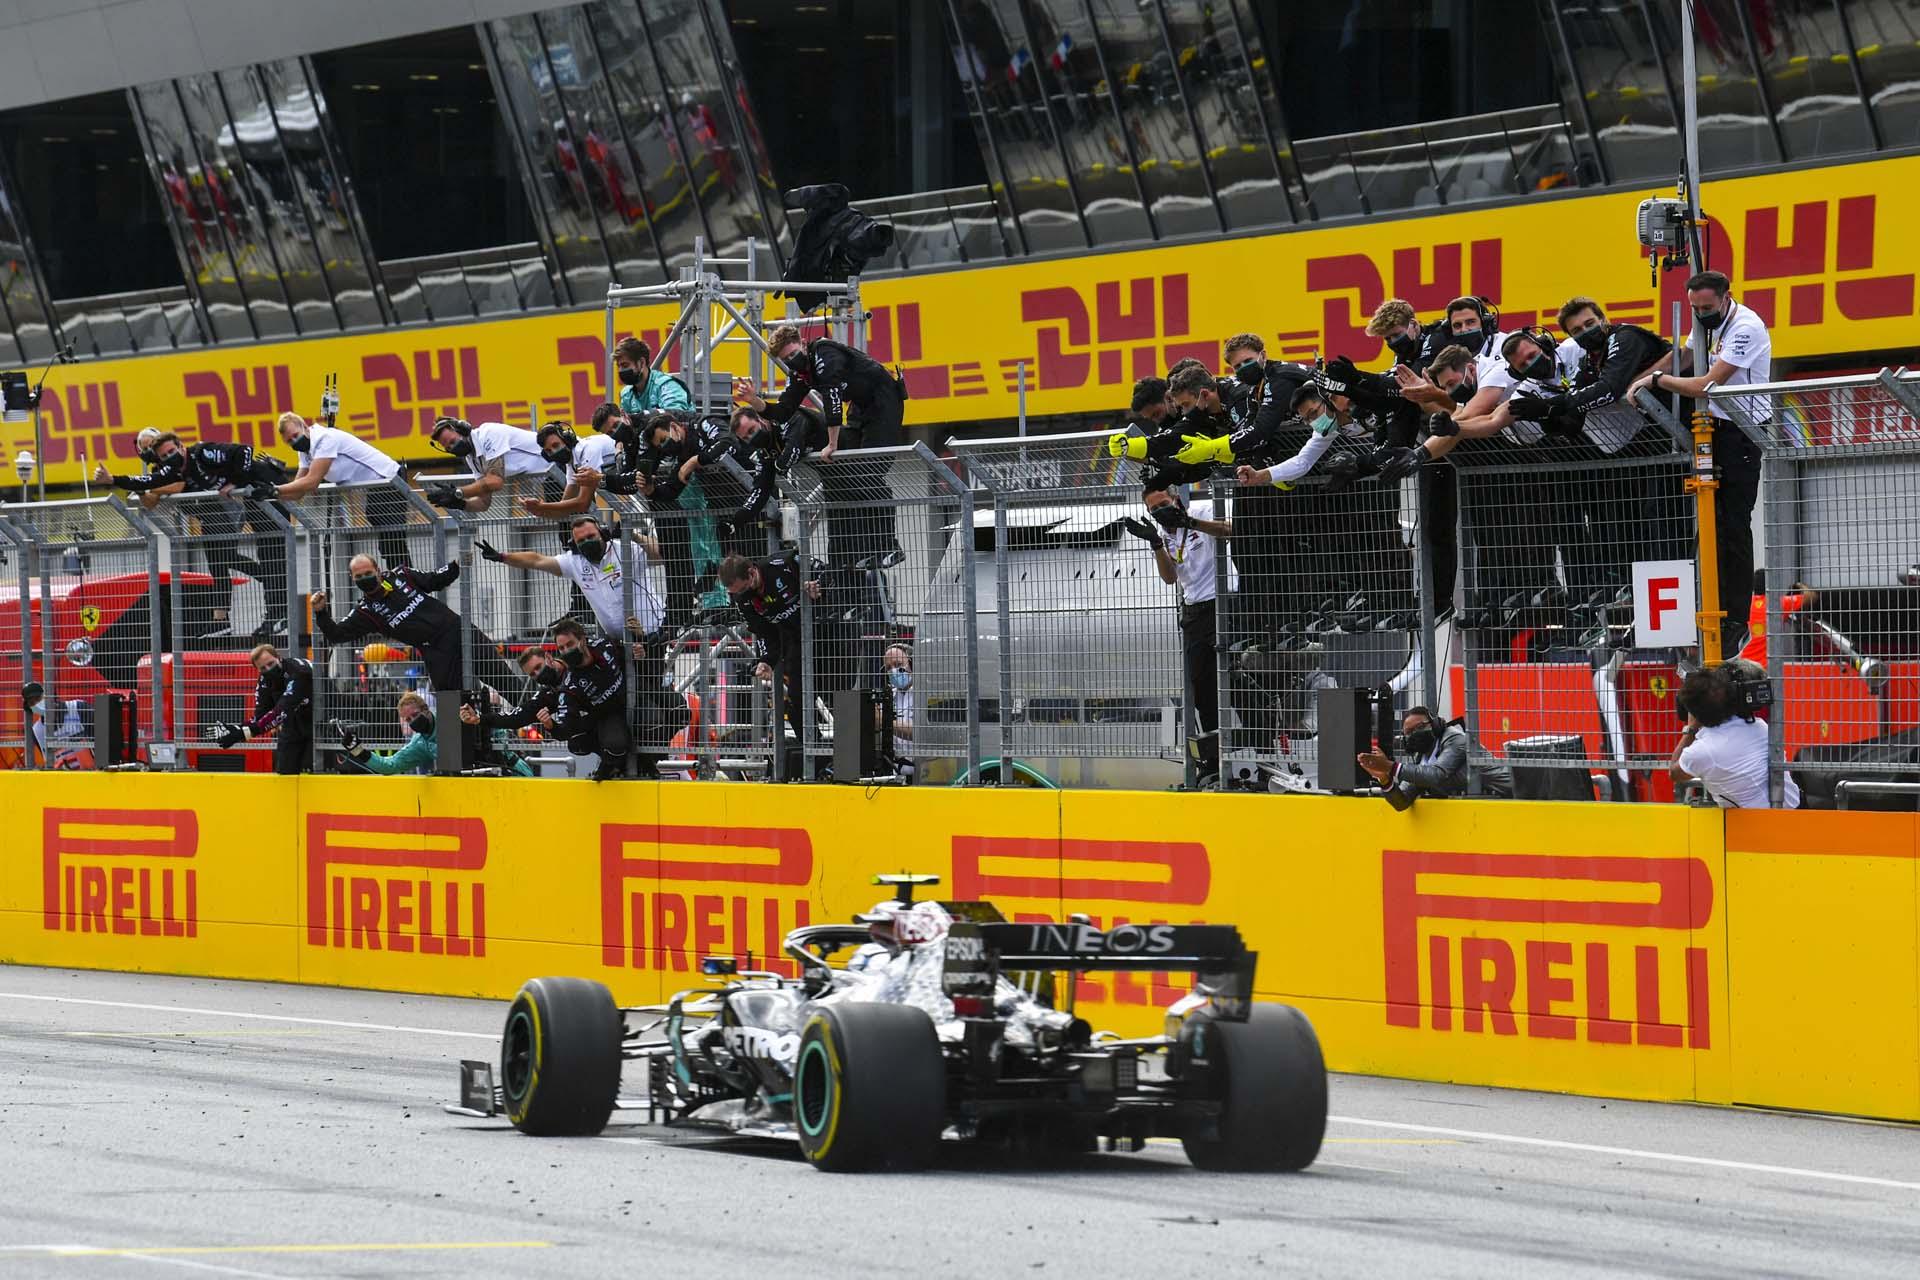 2020 Styrian Grand Prix, Sunday - LAT Images